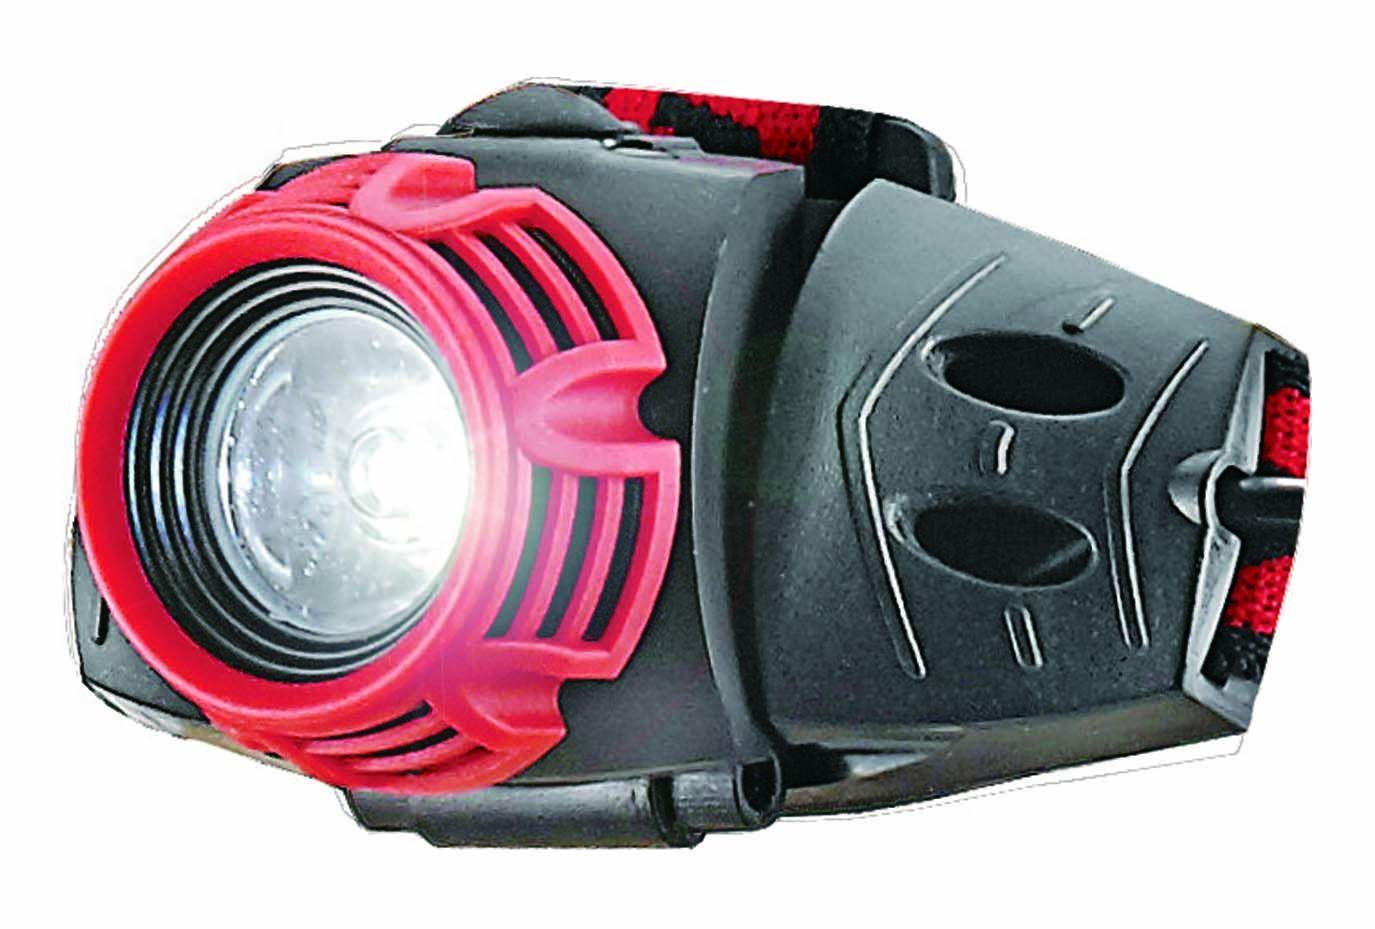 Teng Tools Steady + Flashing Cree LED Head Lamp